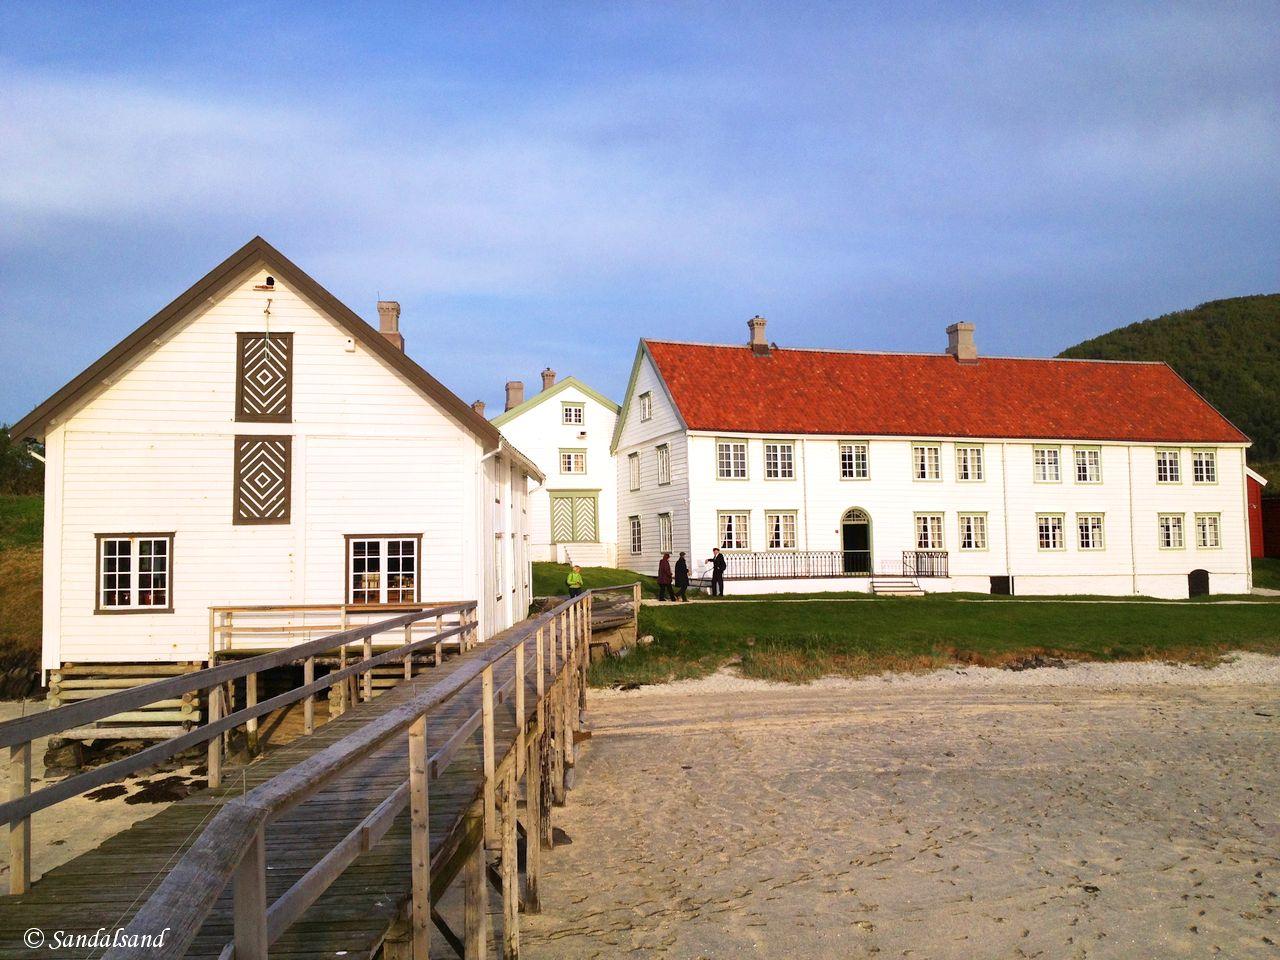 Norway - Nordland - Kjerringøy trading post - Main house